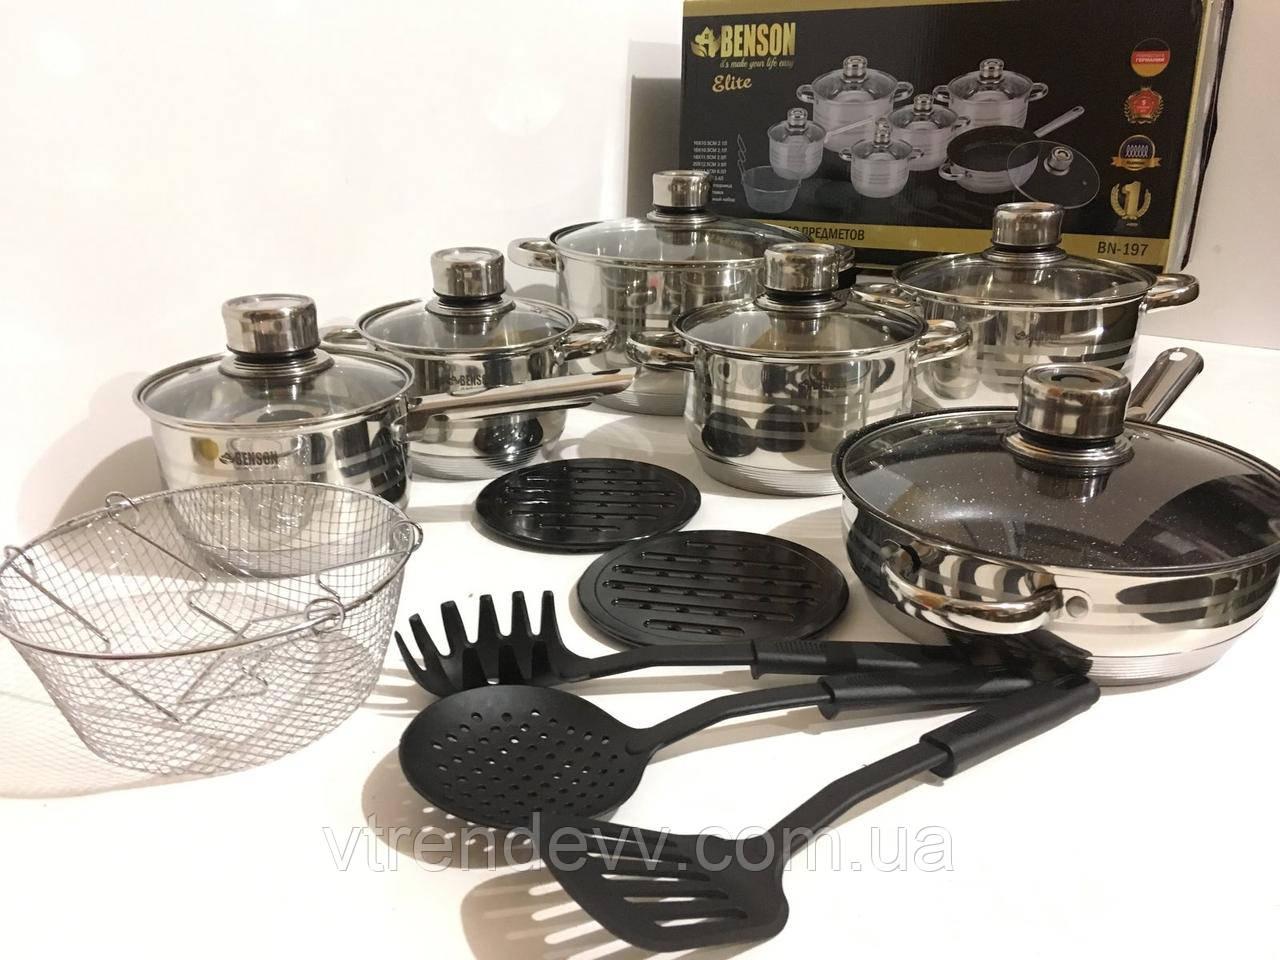 Набор посуды 18 предметов Benson Elite  BN-197